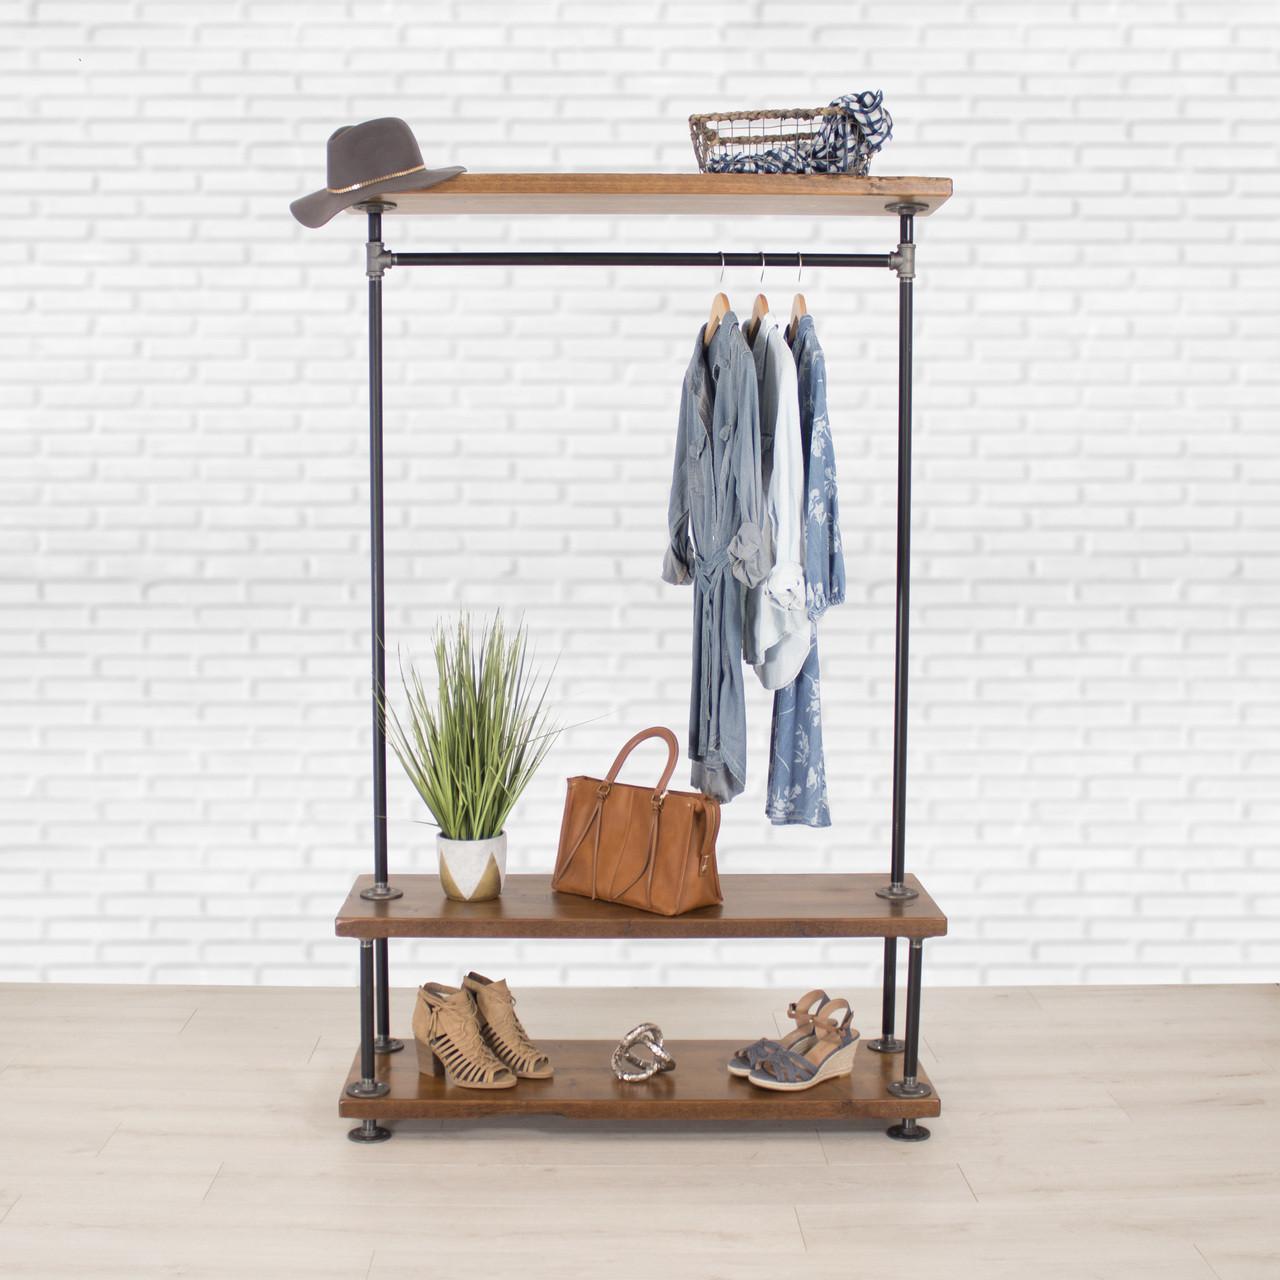 Industrial Pipe Clothing Rack with Cedar Wood Shelves